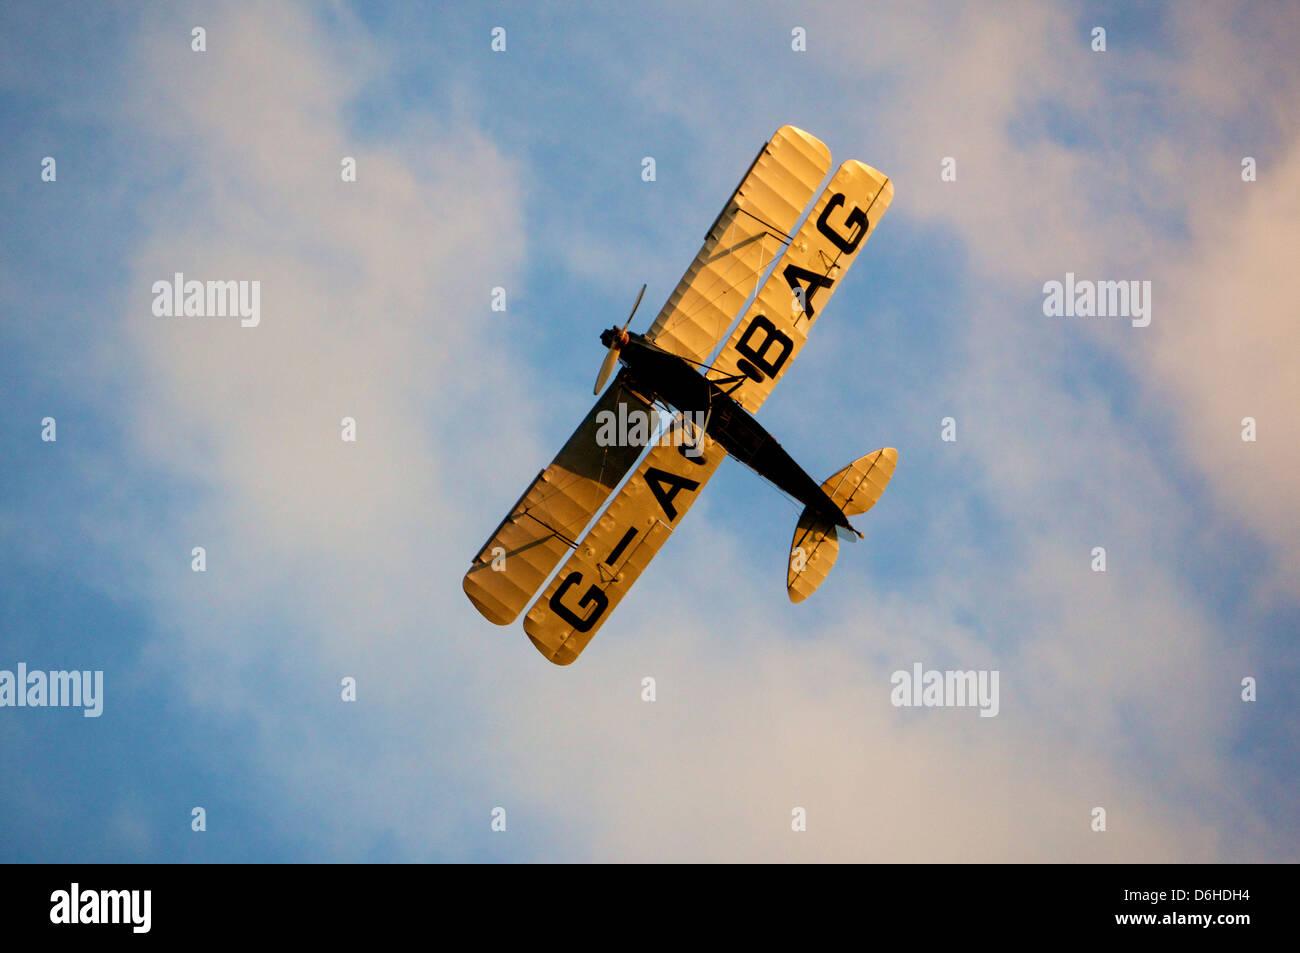 Biplane in flight - Stock Image